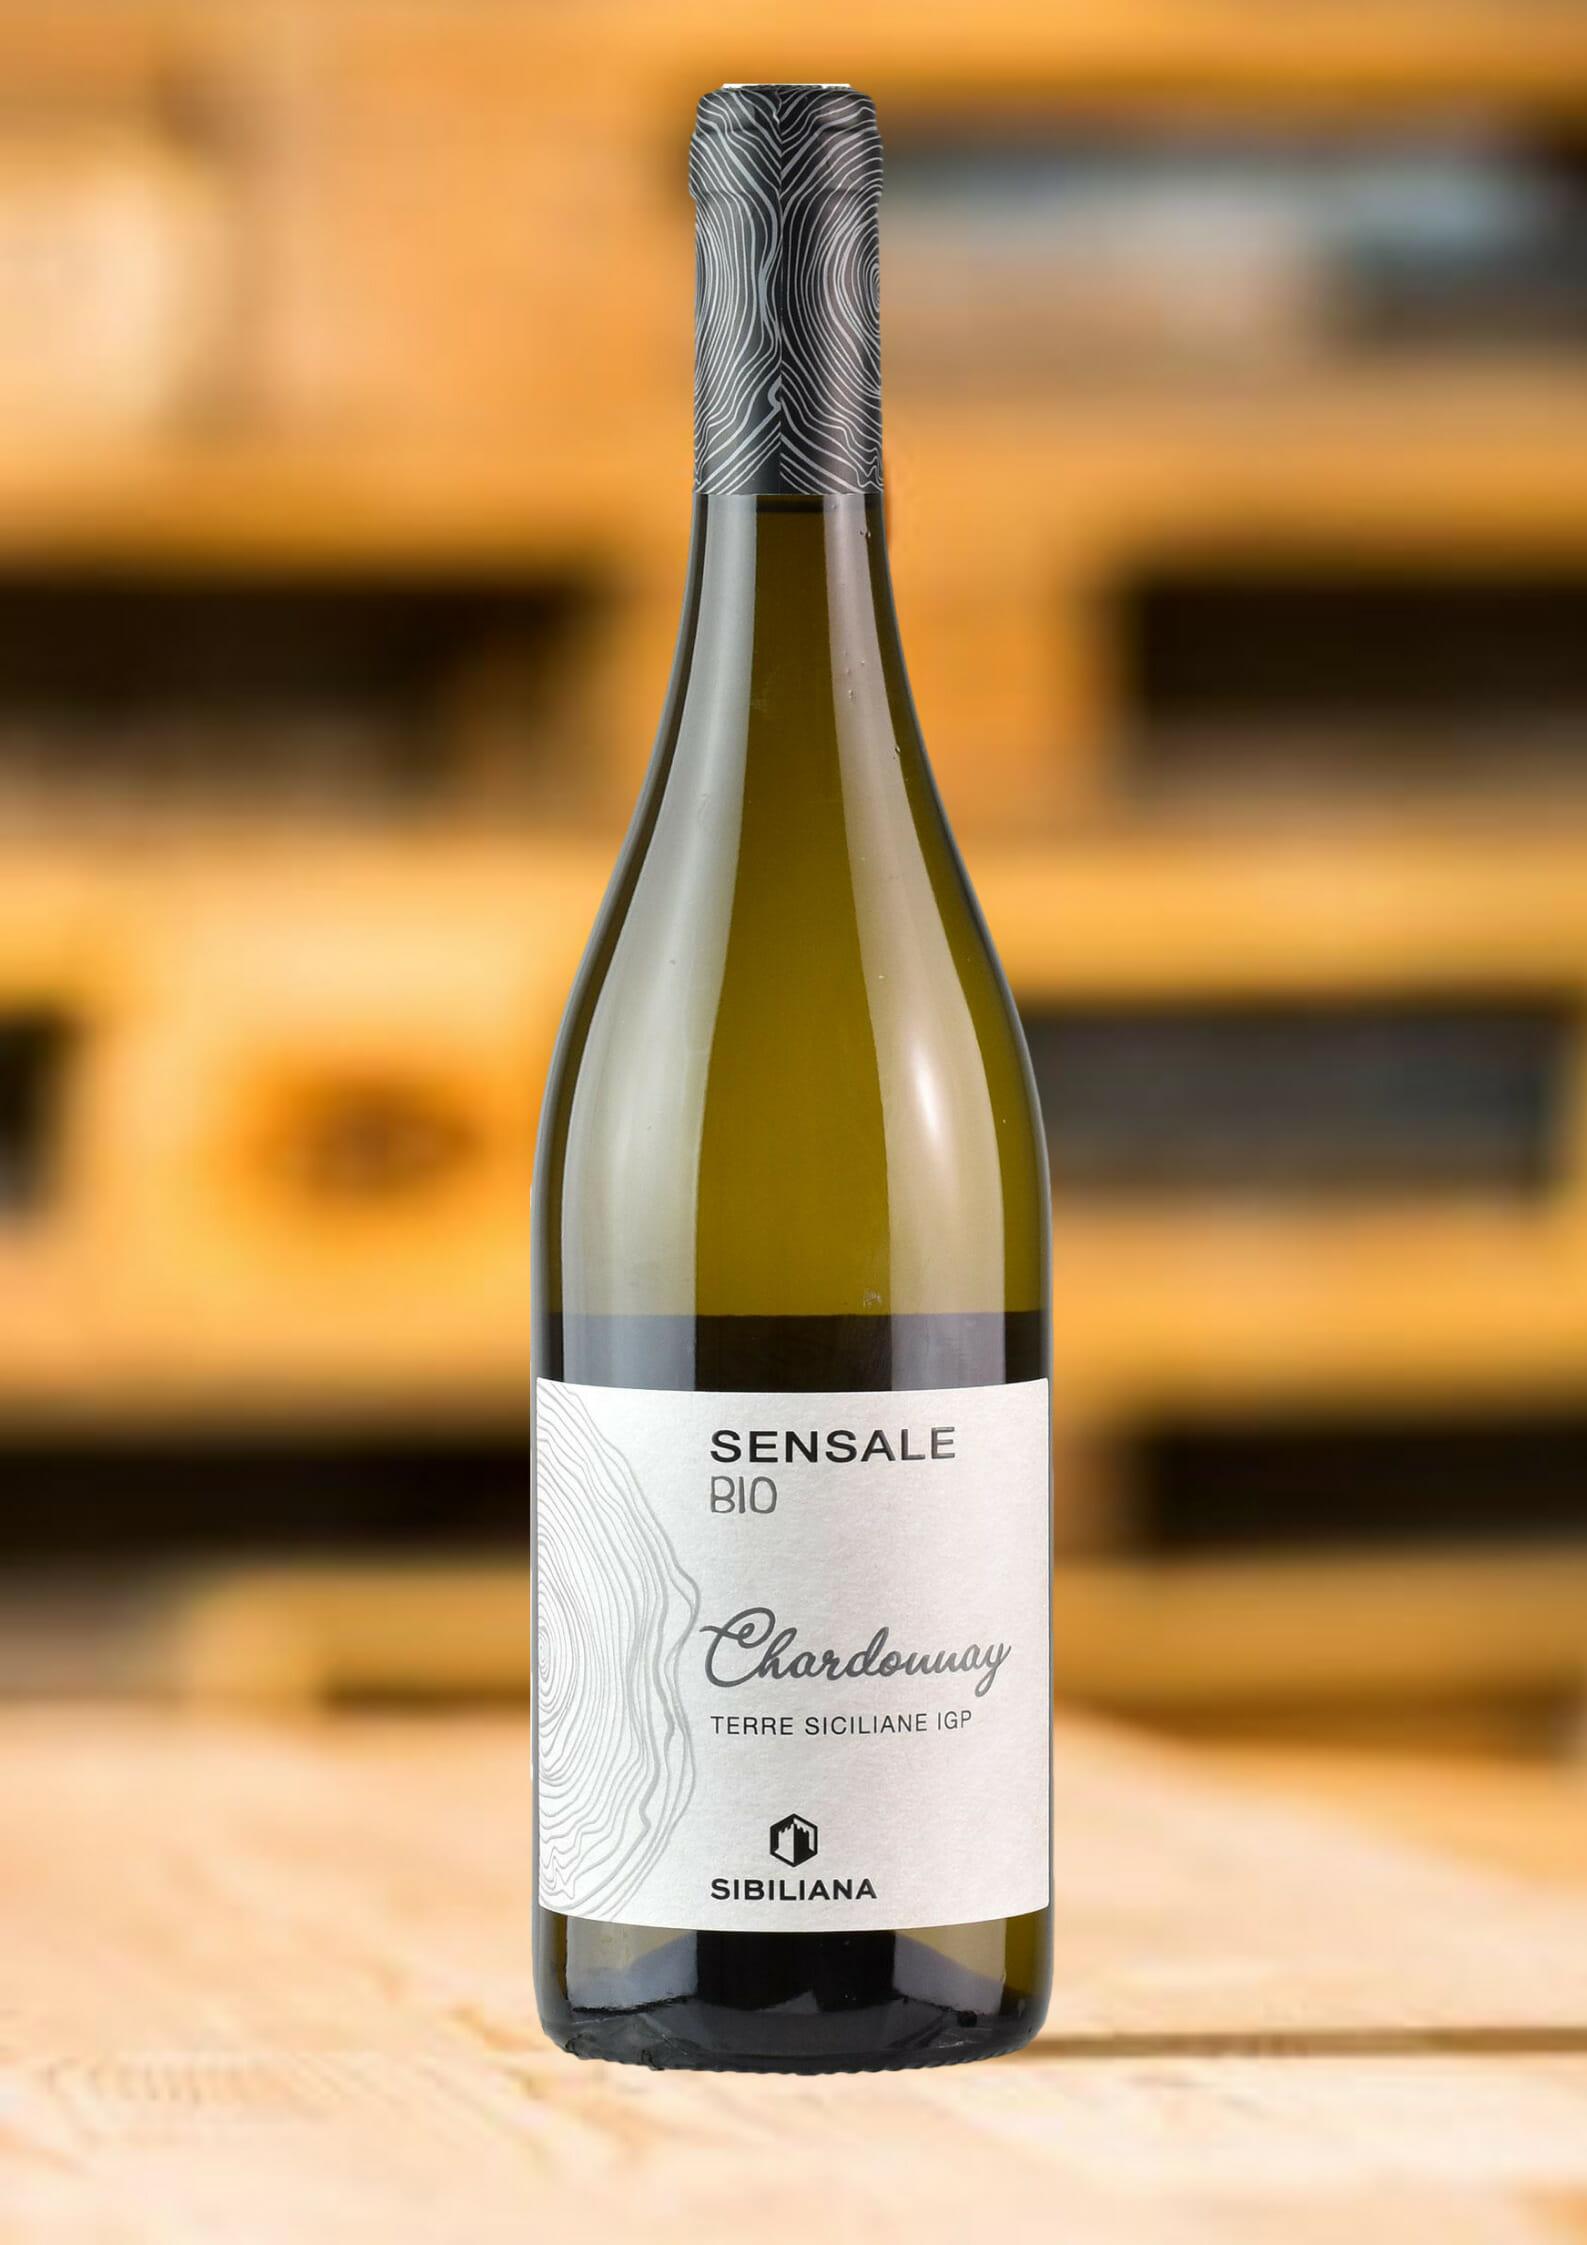 Sensale Chardonnay